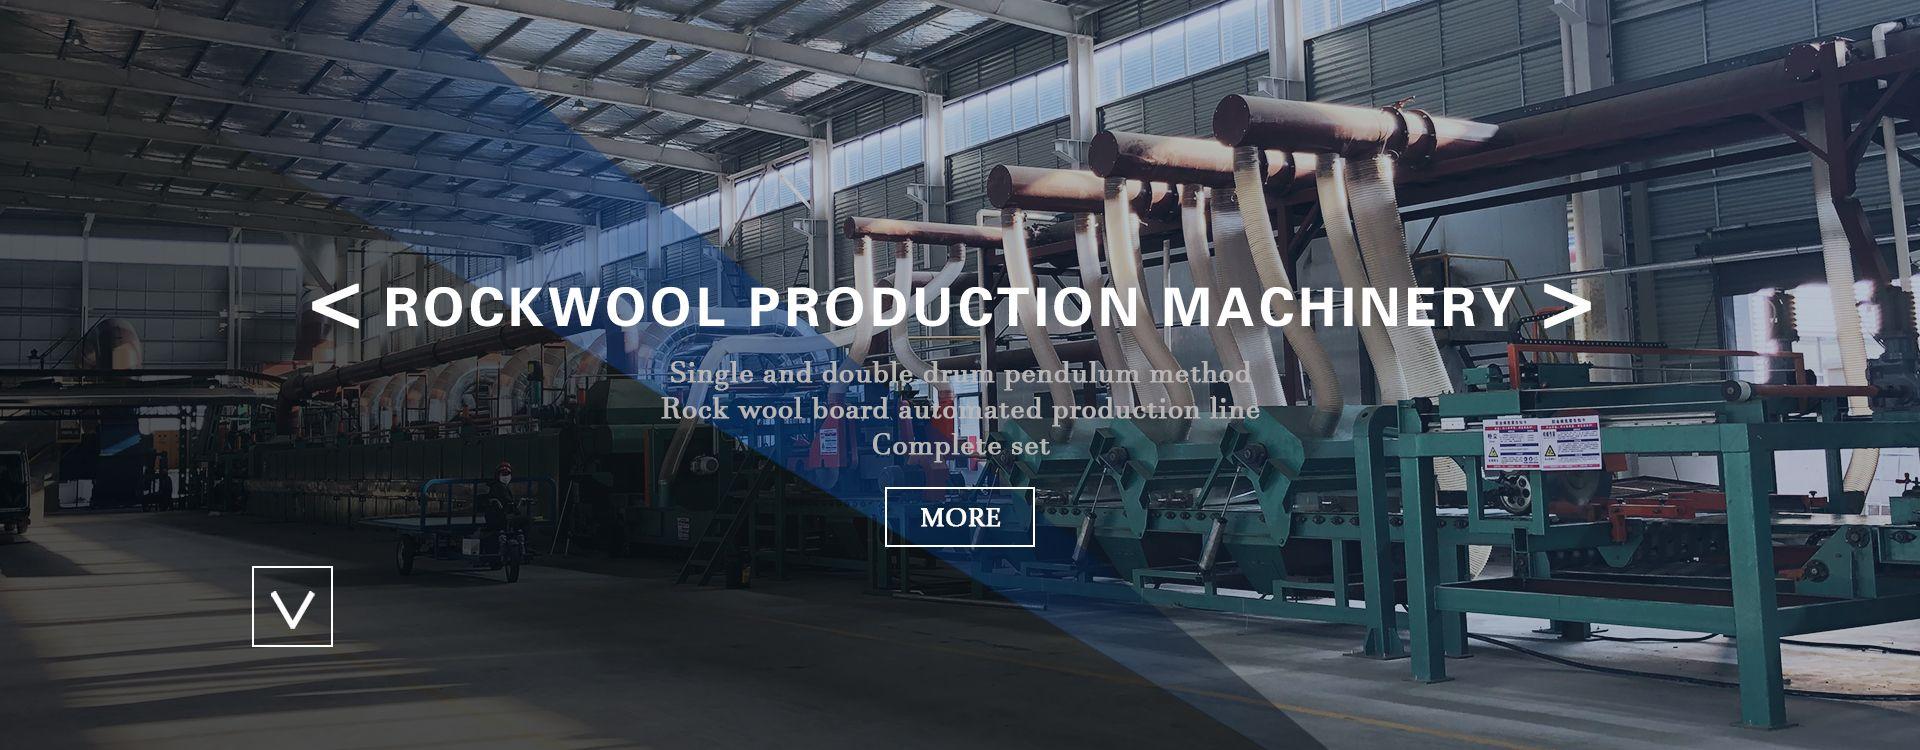 rockwool production machinery